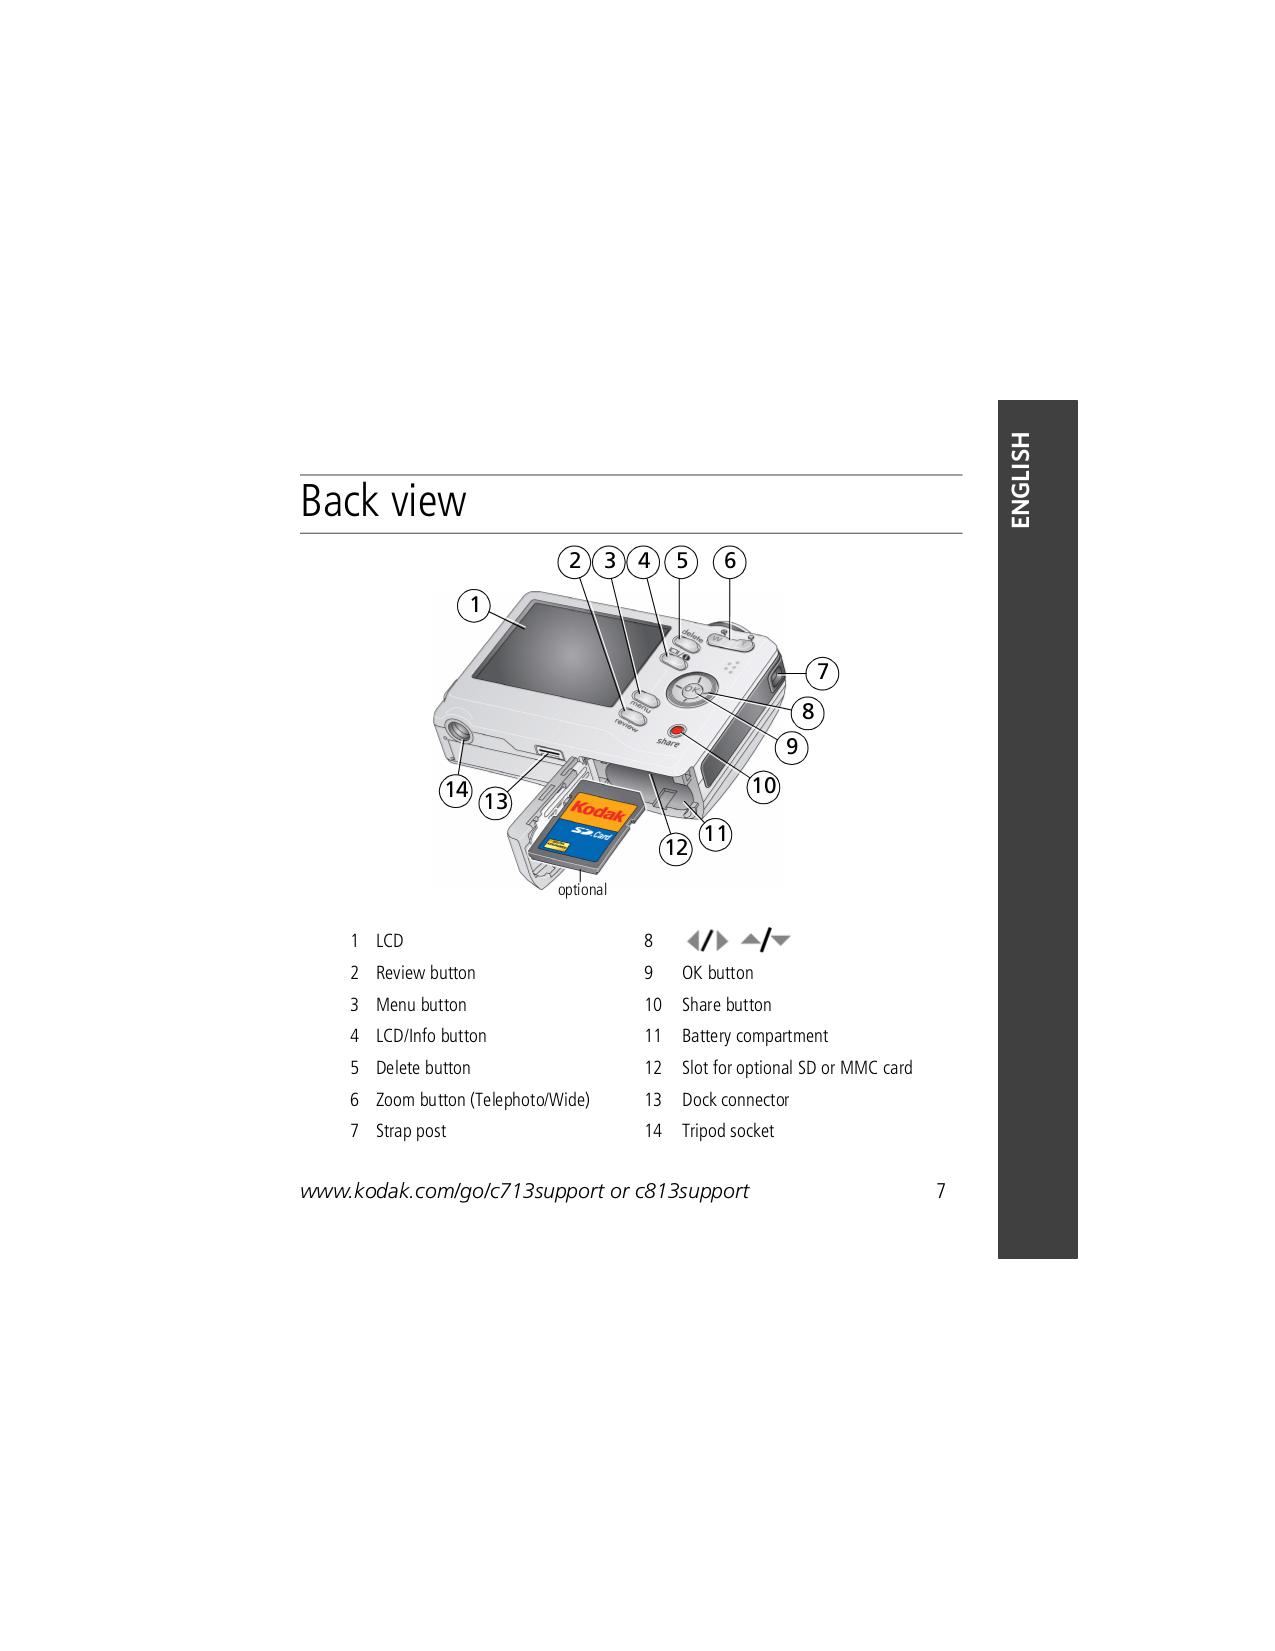 PDF manual for Kodak Digital Camera EasyShare C813